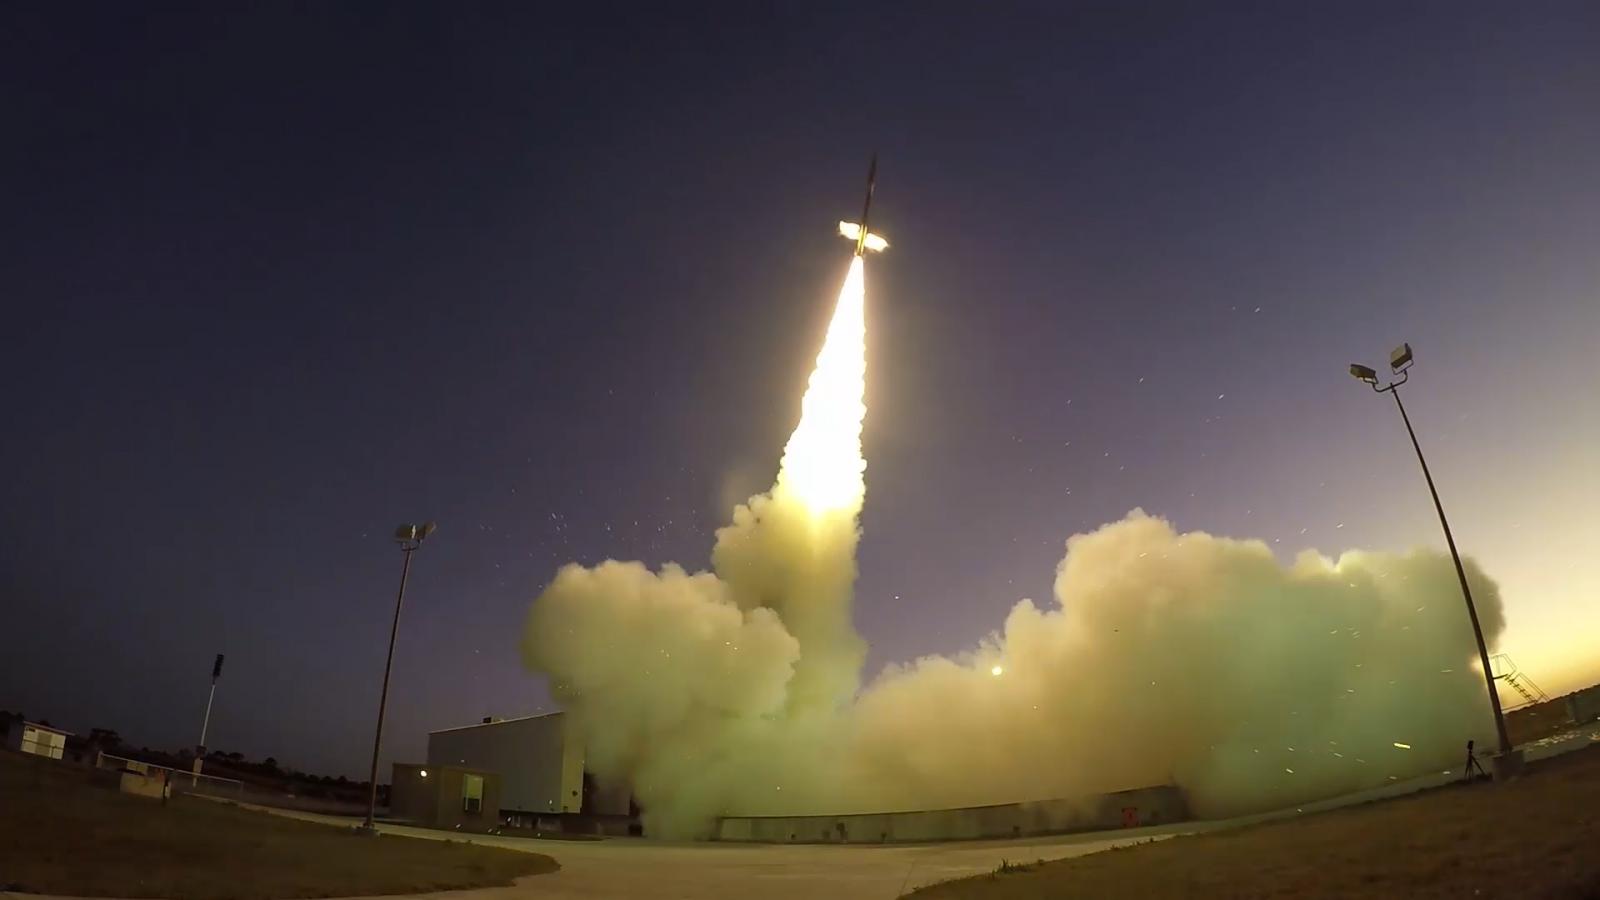 NASA supersonic parachute test